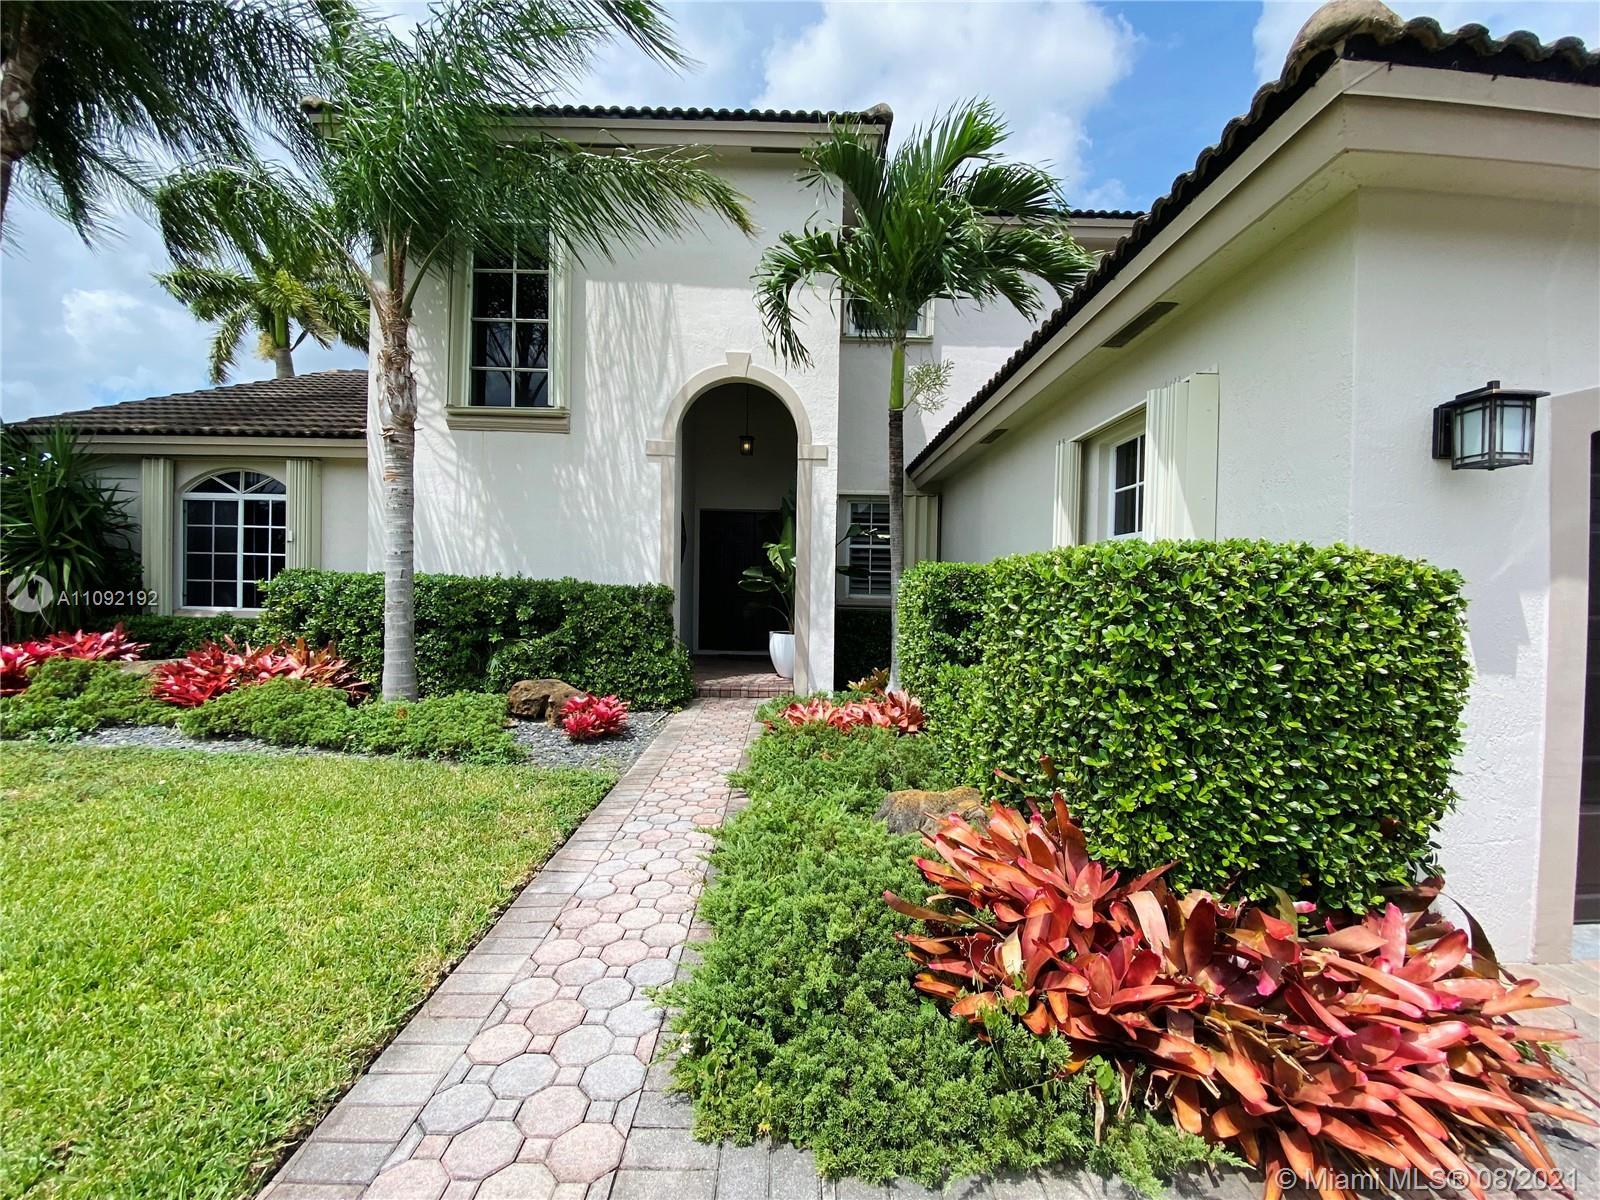 Kessler Grove - 17230 SW 153rd Ct, Miami, FL 33187